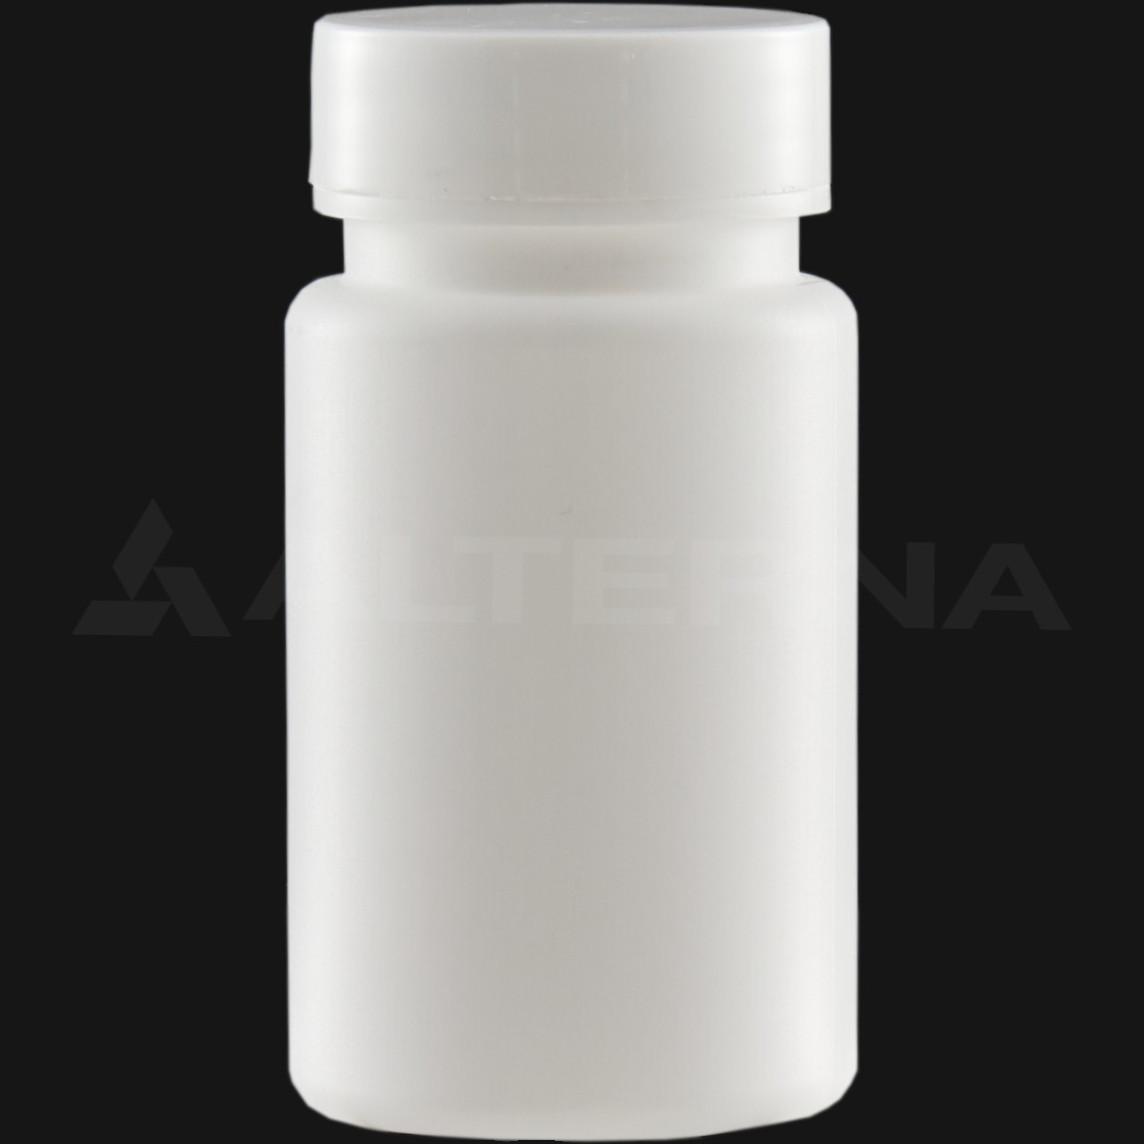 90 ml HDPE Pill Bottle with 38 mm Alu. Foil Seal Cap